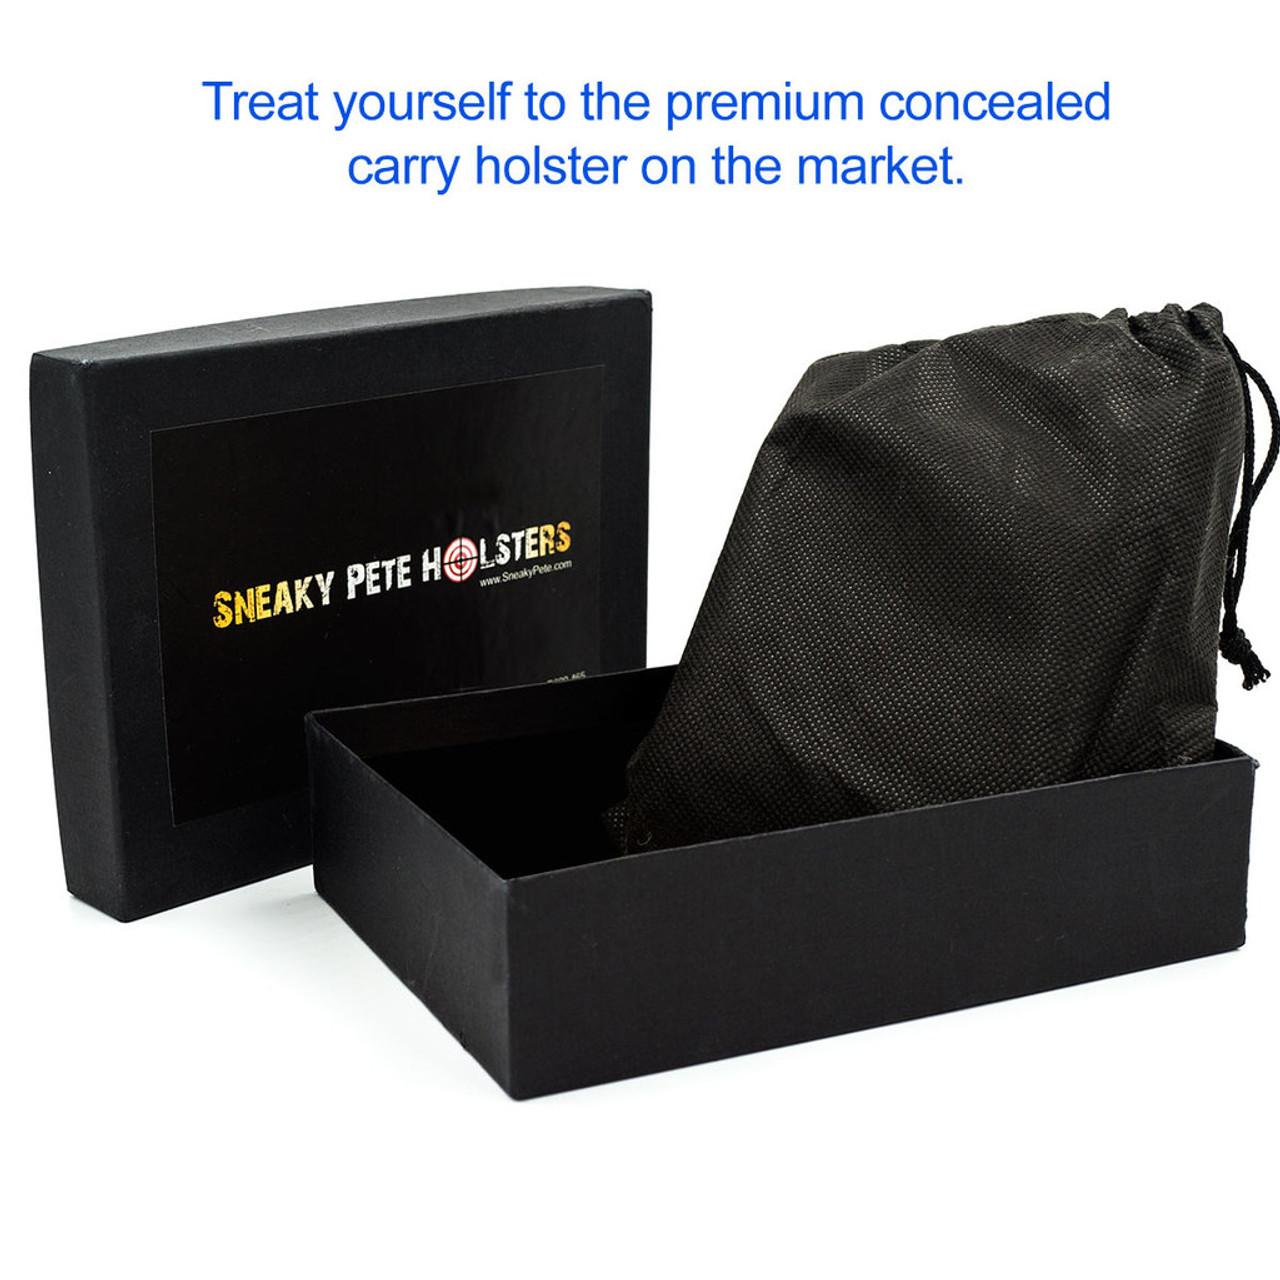 BodyGuard 380 Value Package 2